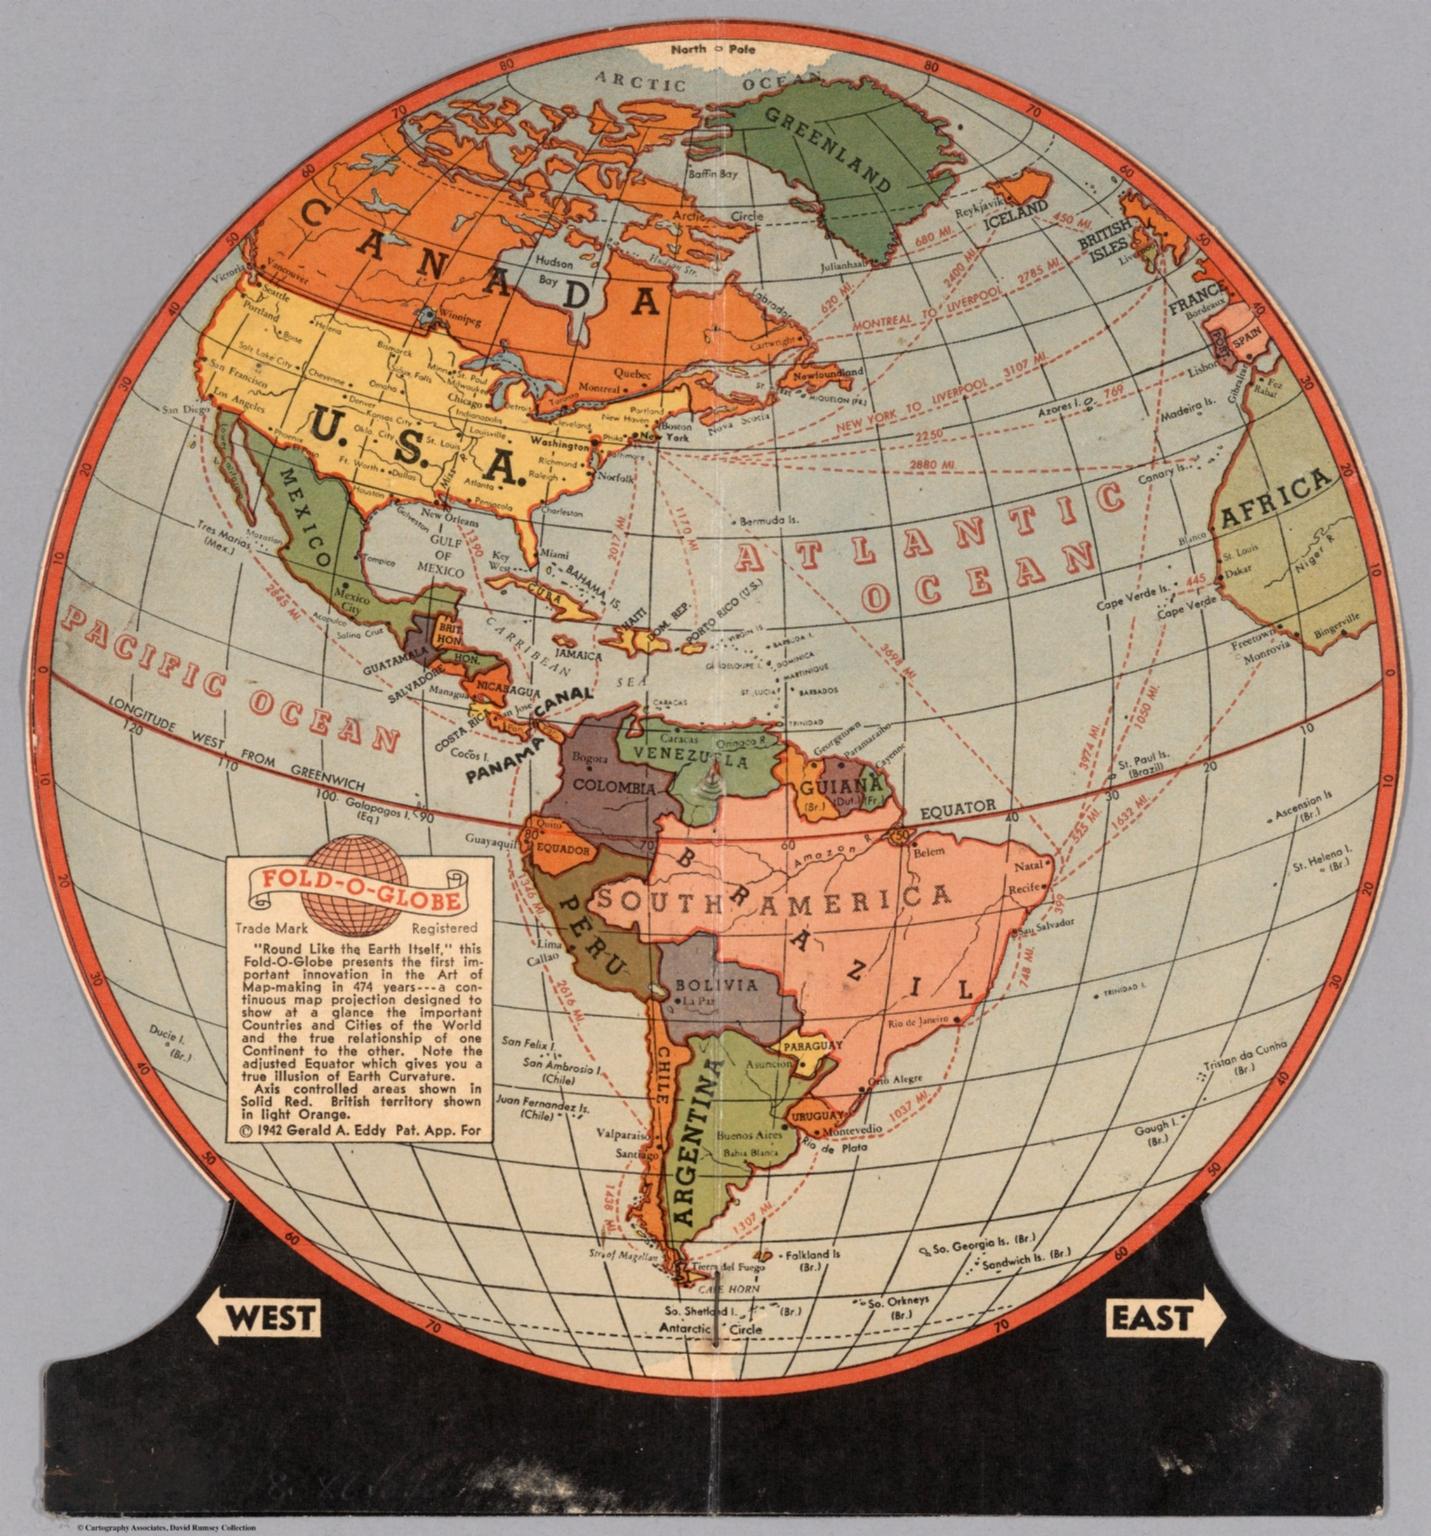 Round Globe Map.Fold O Globe Trade Mark Registered Round Like The Earth David